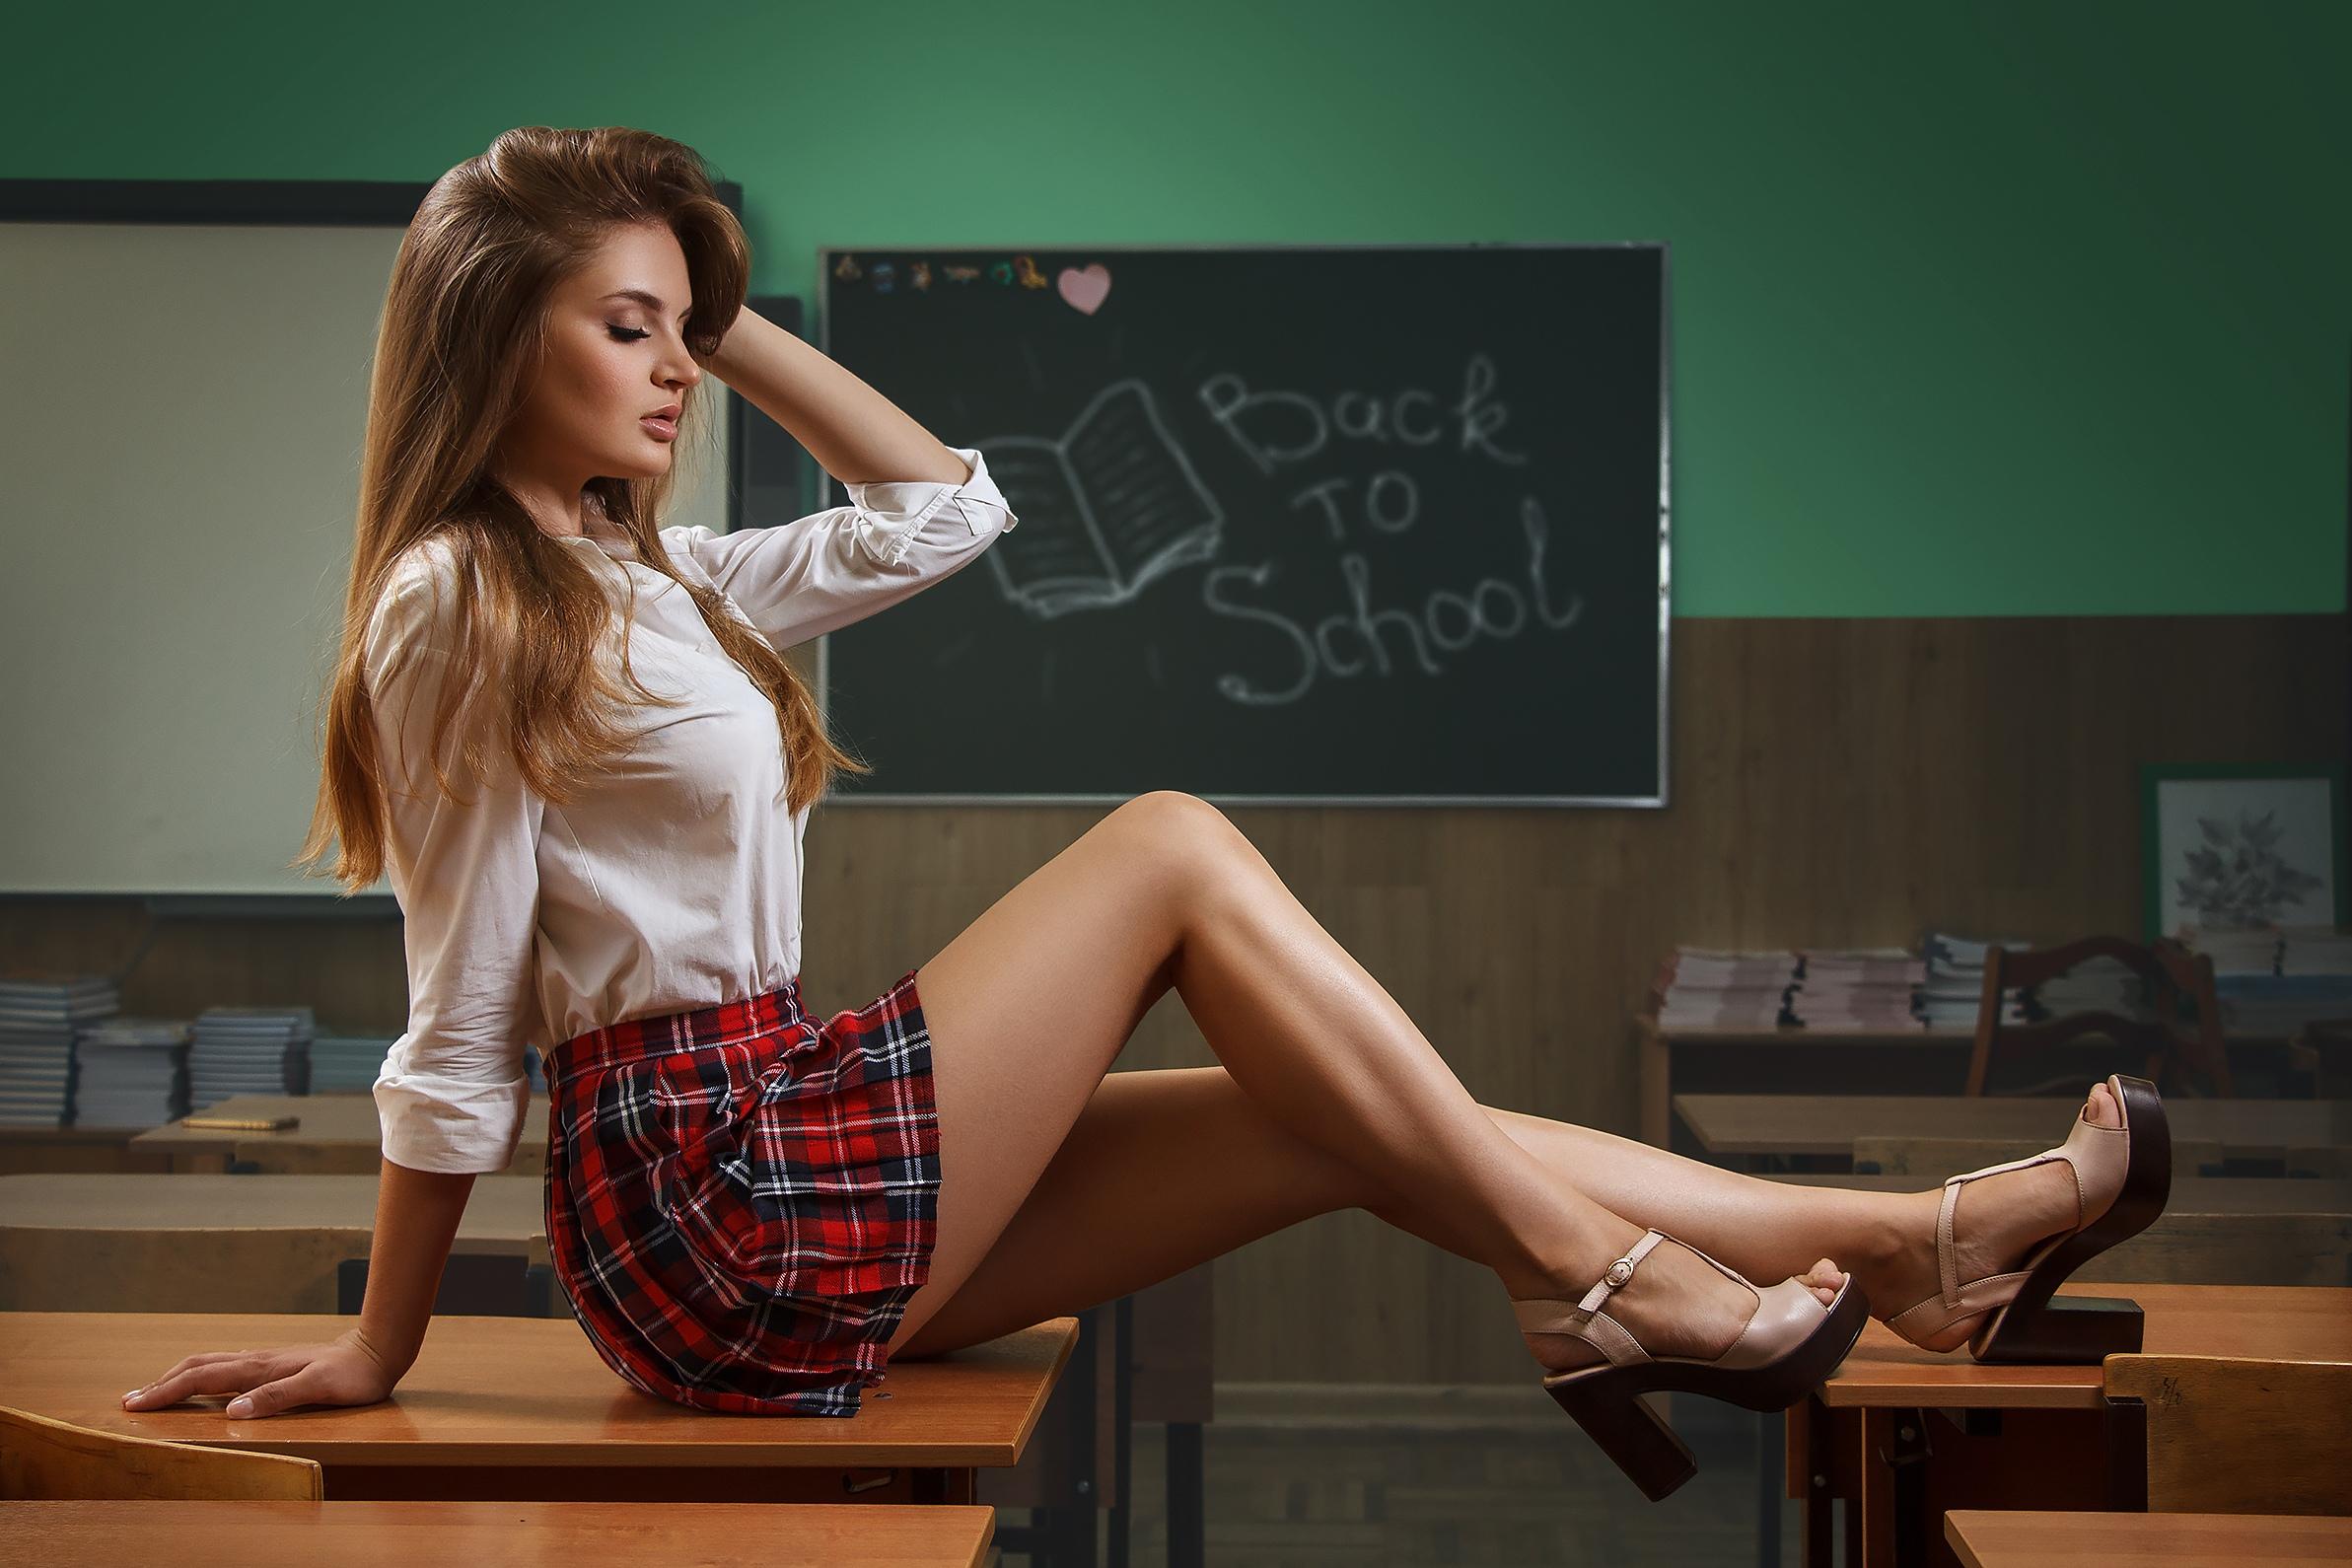 827902f87a women blonde portrait white shirt plaid skirt schoolgirl uniform sitting  closed eyes high heels